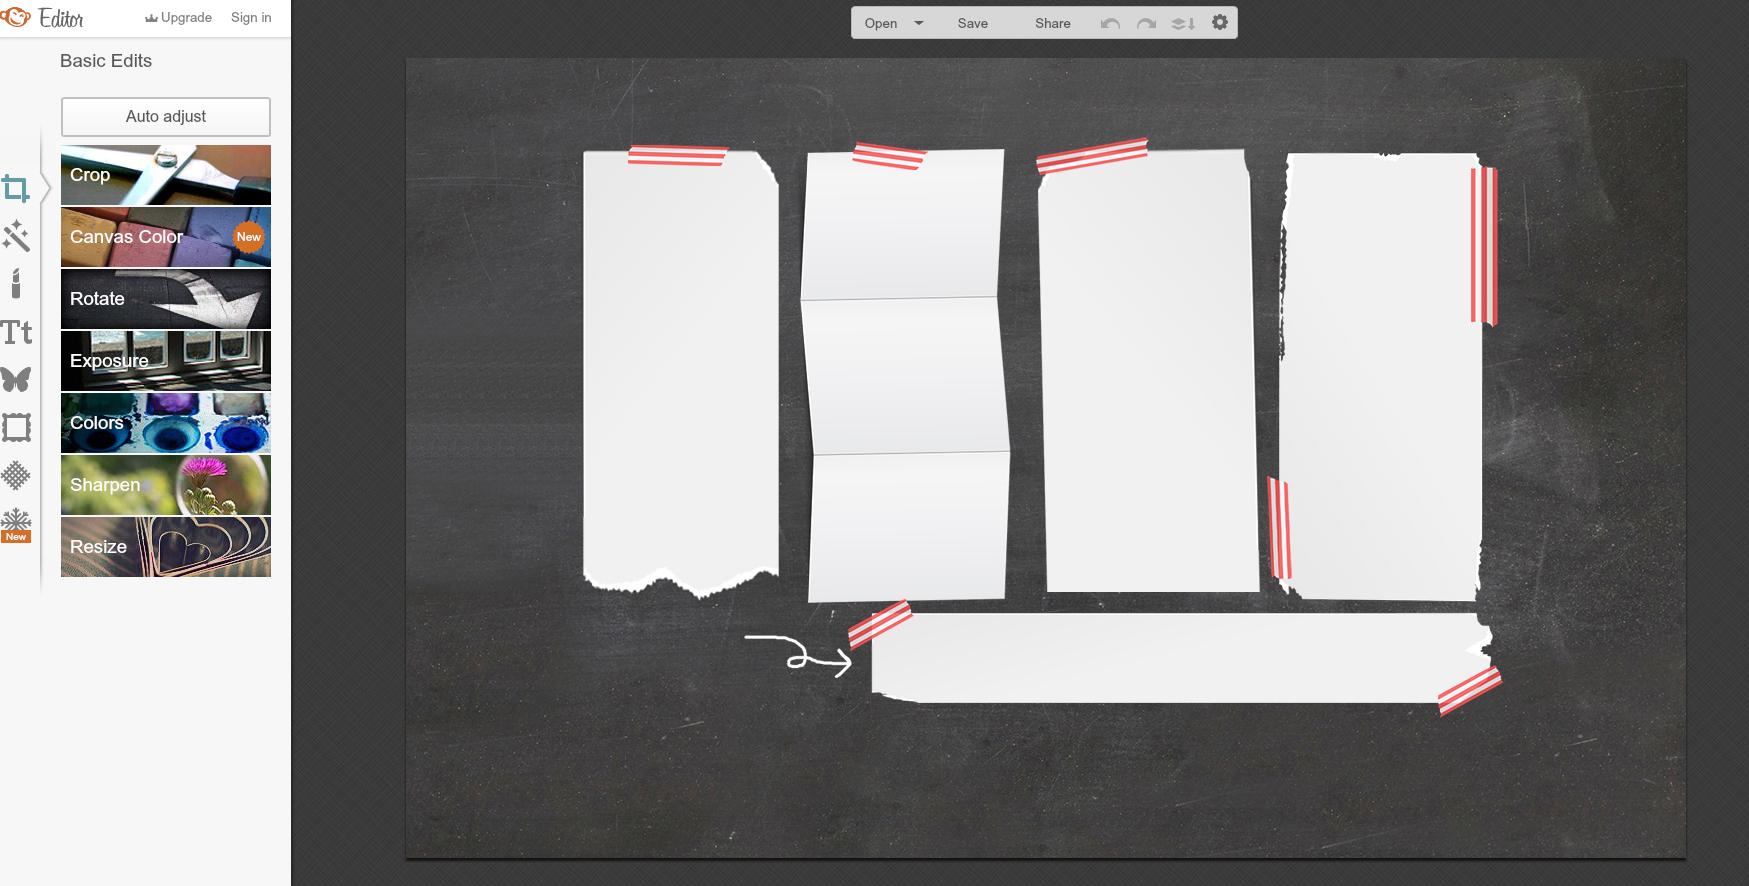 Chalkboard Computer Desktop Wallpaper Organizer Free Download Computer Wallpaper Desktop Wallpapers Desktop Wallpaper Organizer Desktop Wallpaper